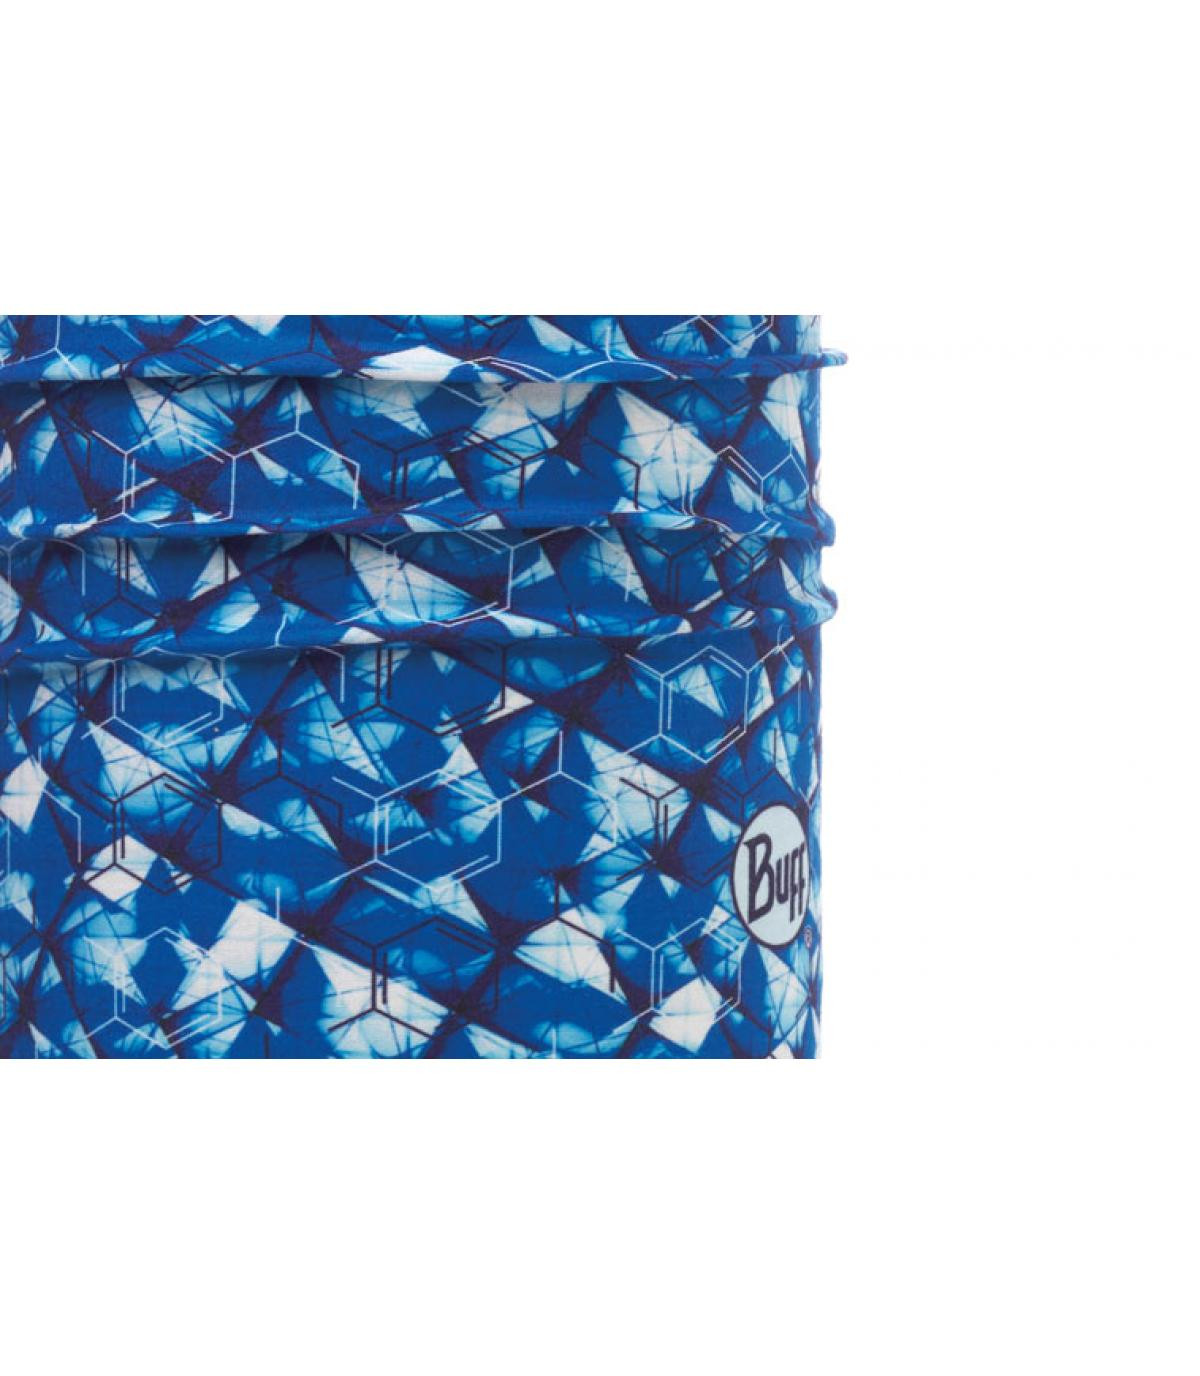 Details Perform Adren Cape blue - afbeeling 2